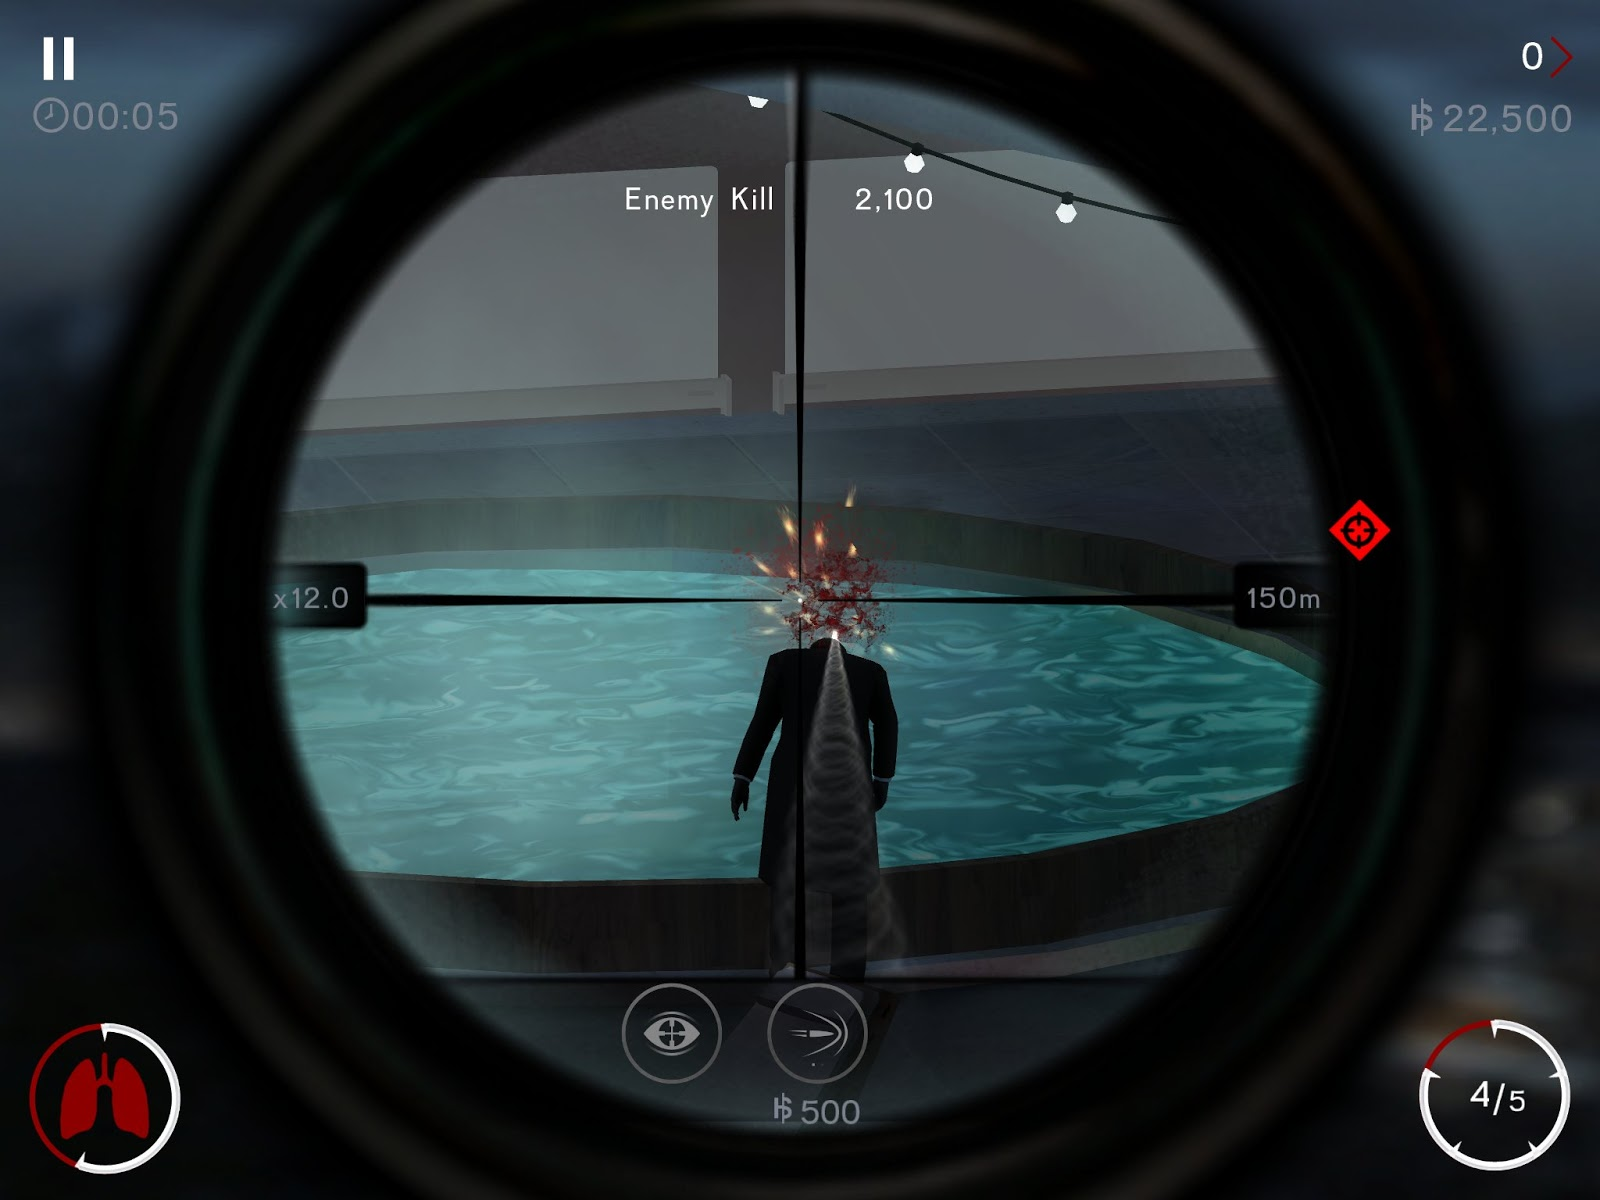 Hitman Sniper Android Wallpaper Hitman Sniper V1.2.43823 Mod